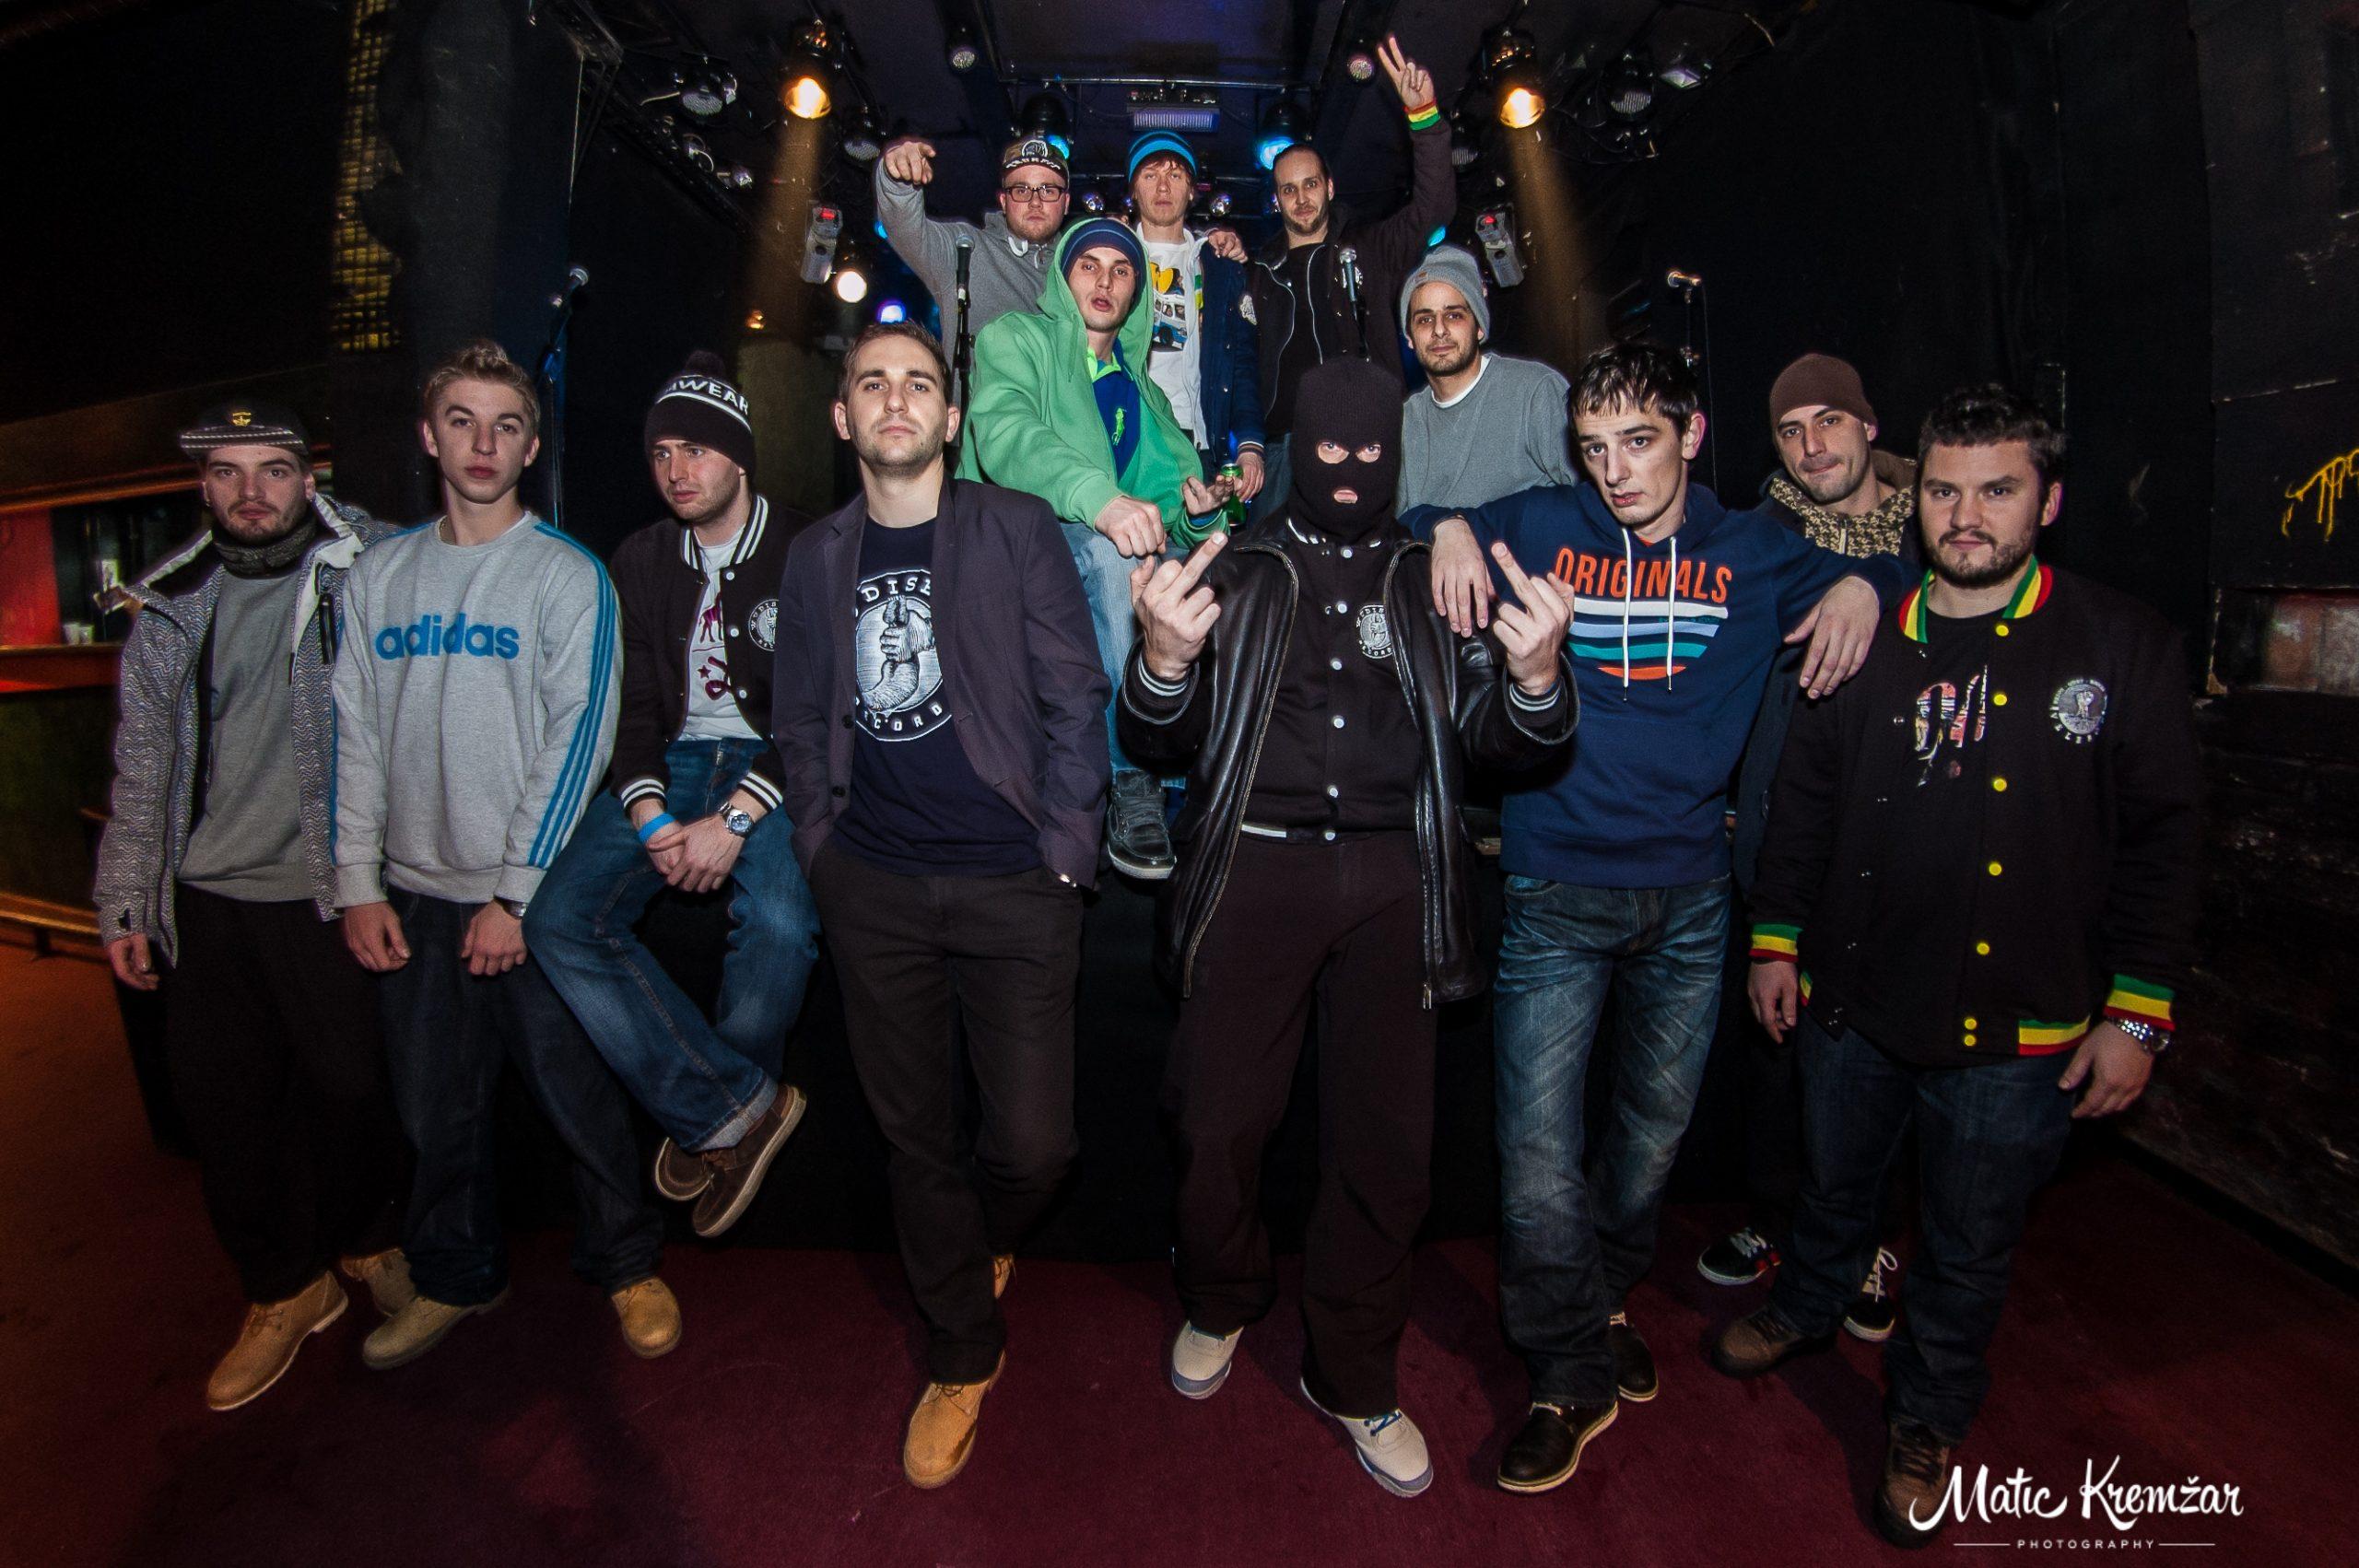 VELEBOR - WUDISBAN REMIX f. Amo, Nite, Mladich, Tropski, Nemir Tadija, Drill, Burke & DJ Sunny Sun